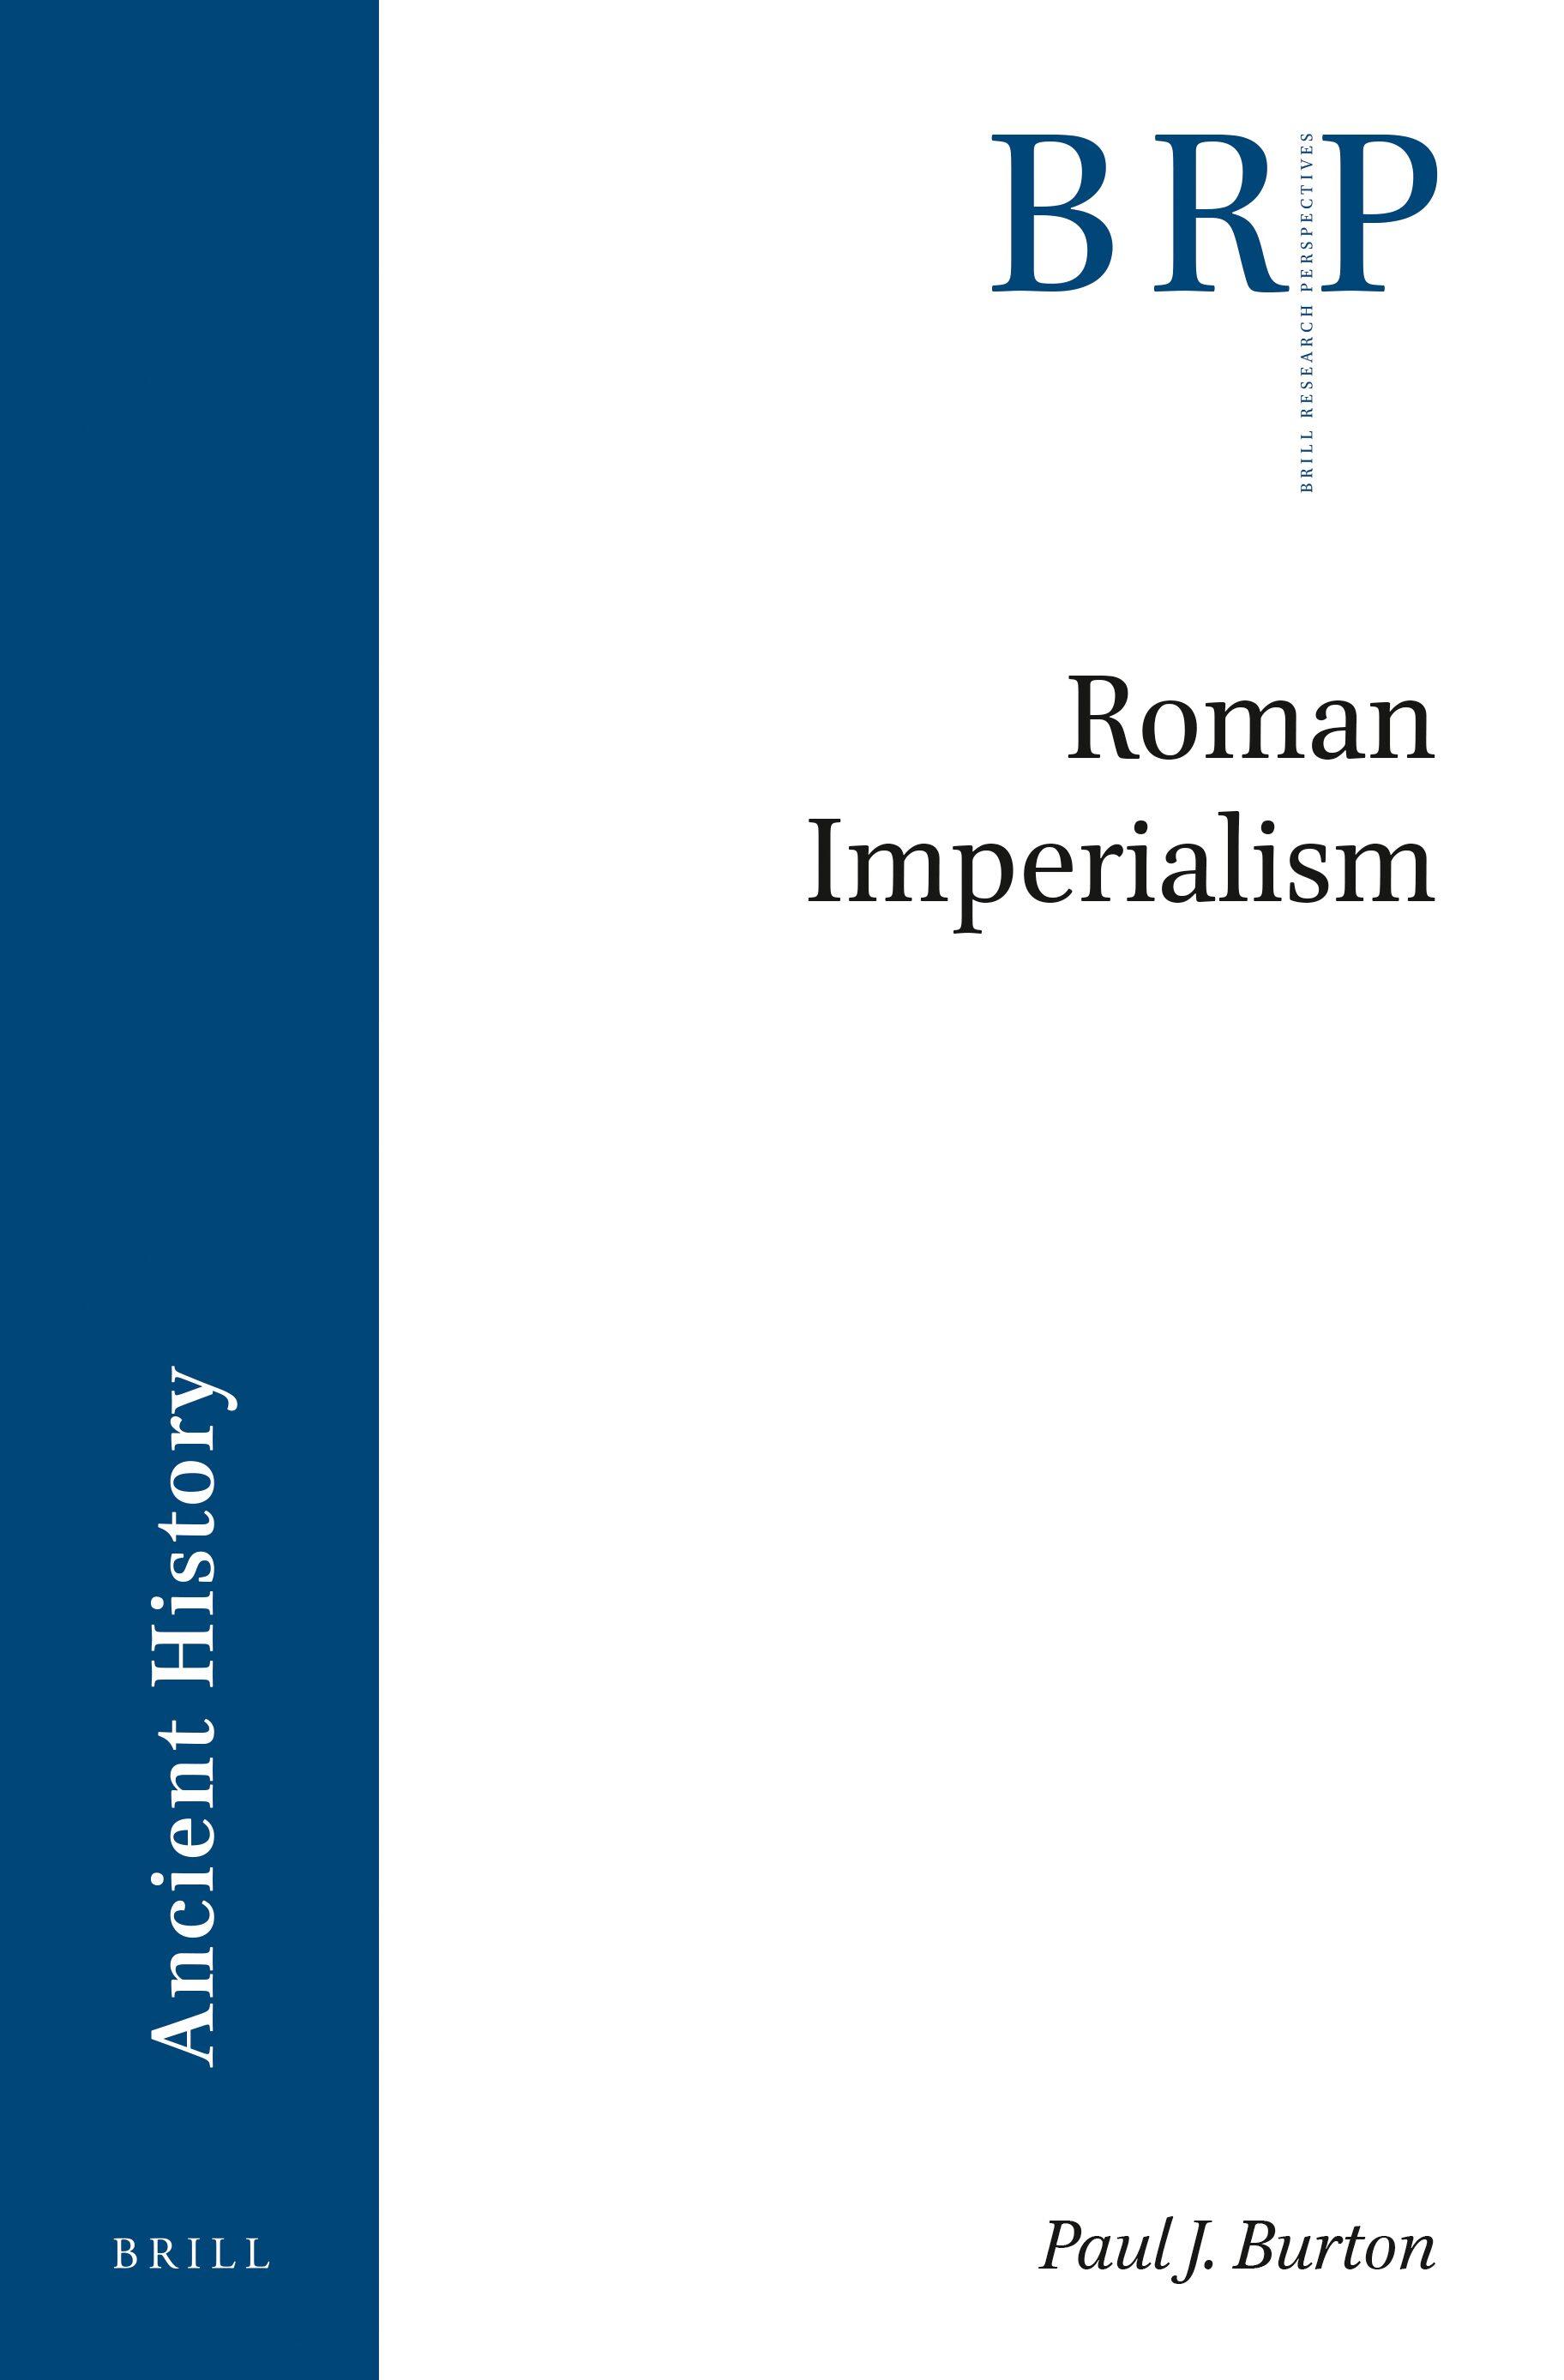 Roman Imperialism in Roman Imperialism